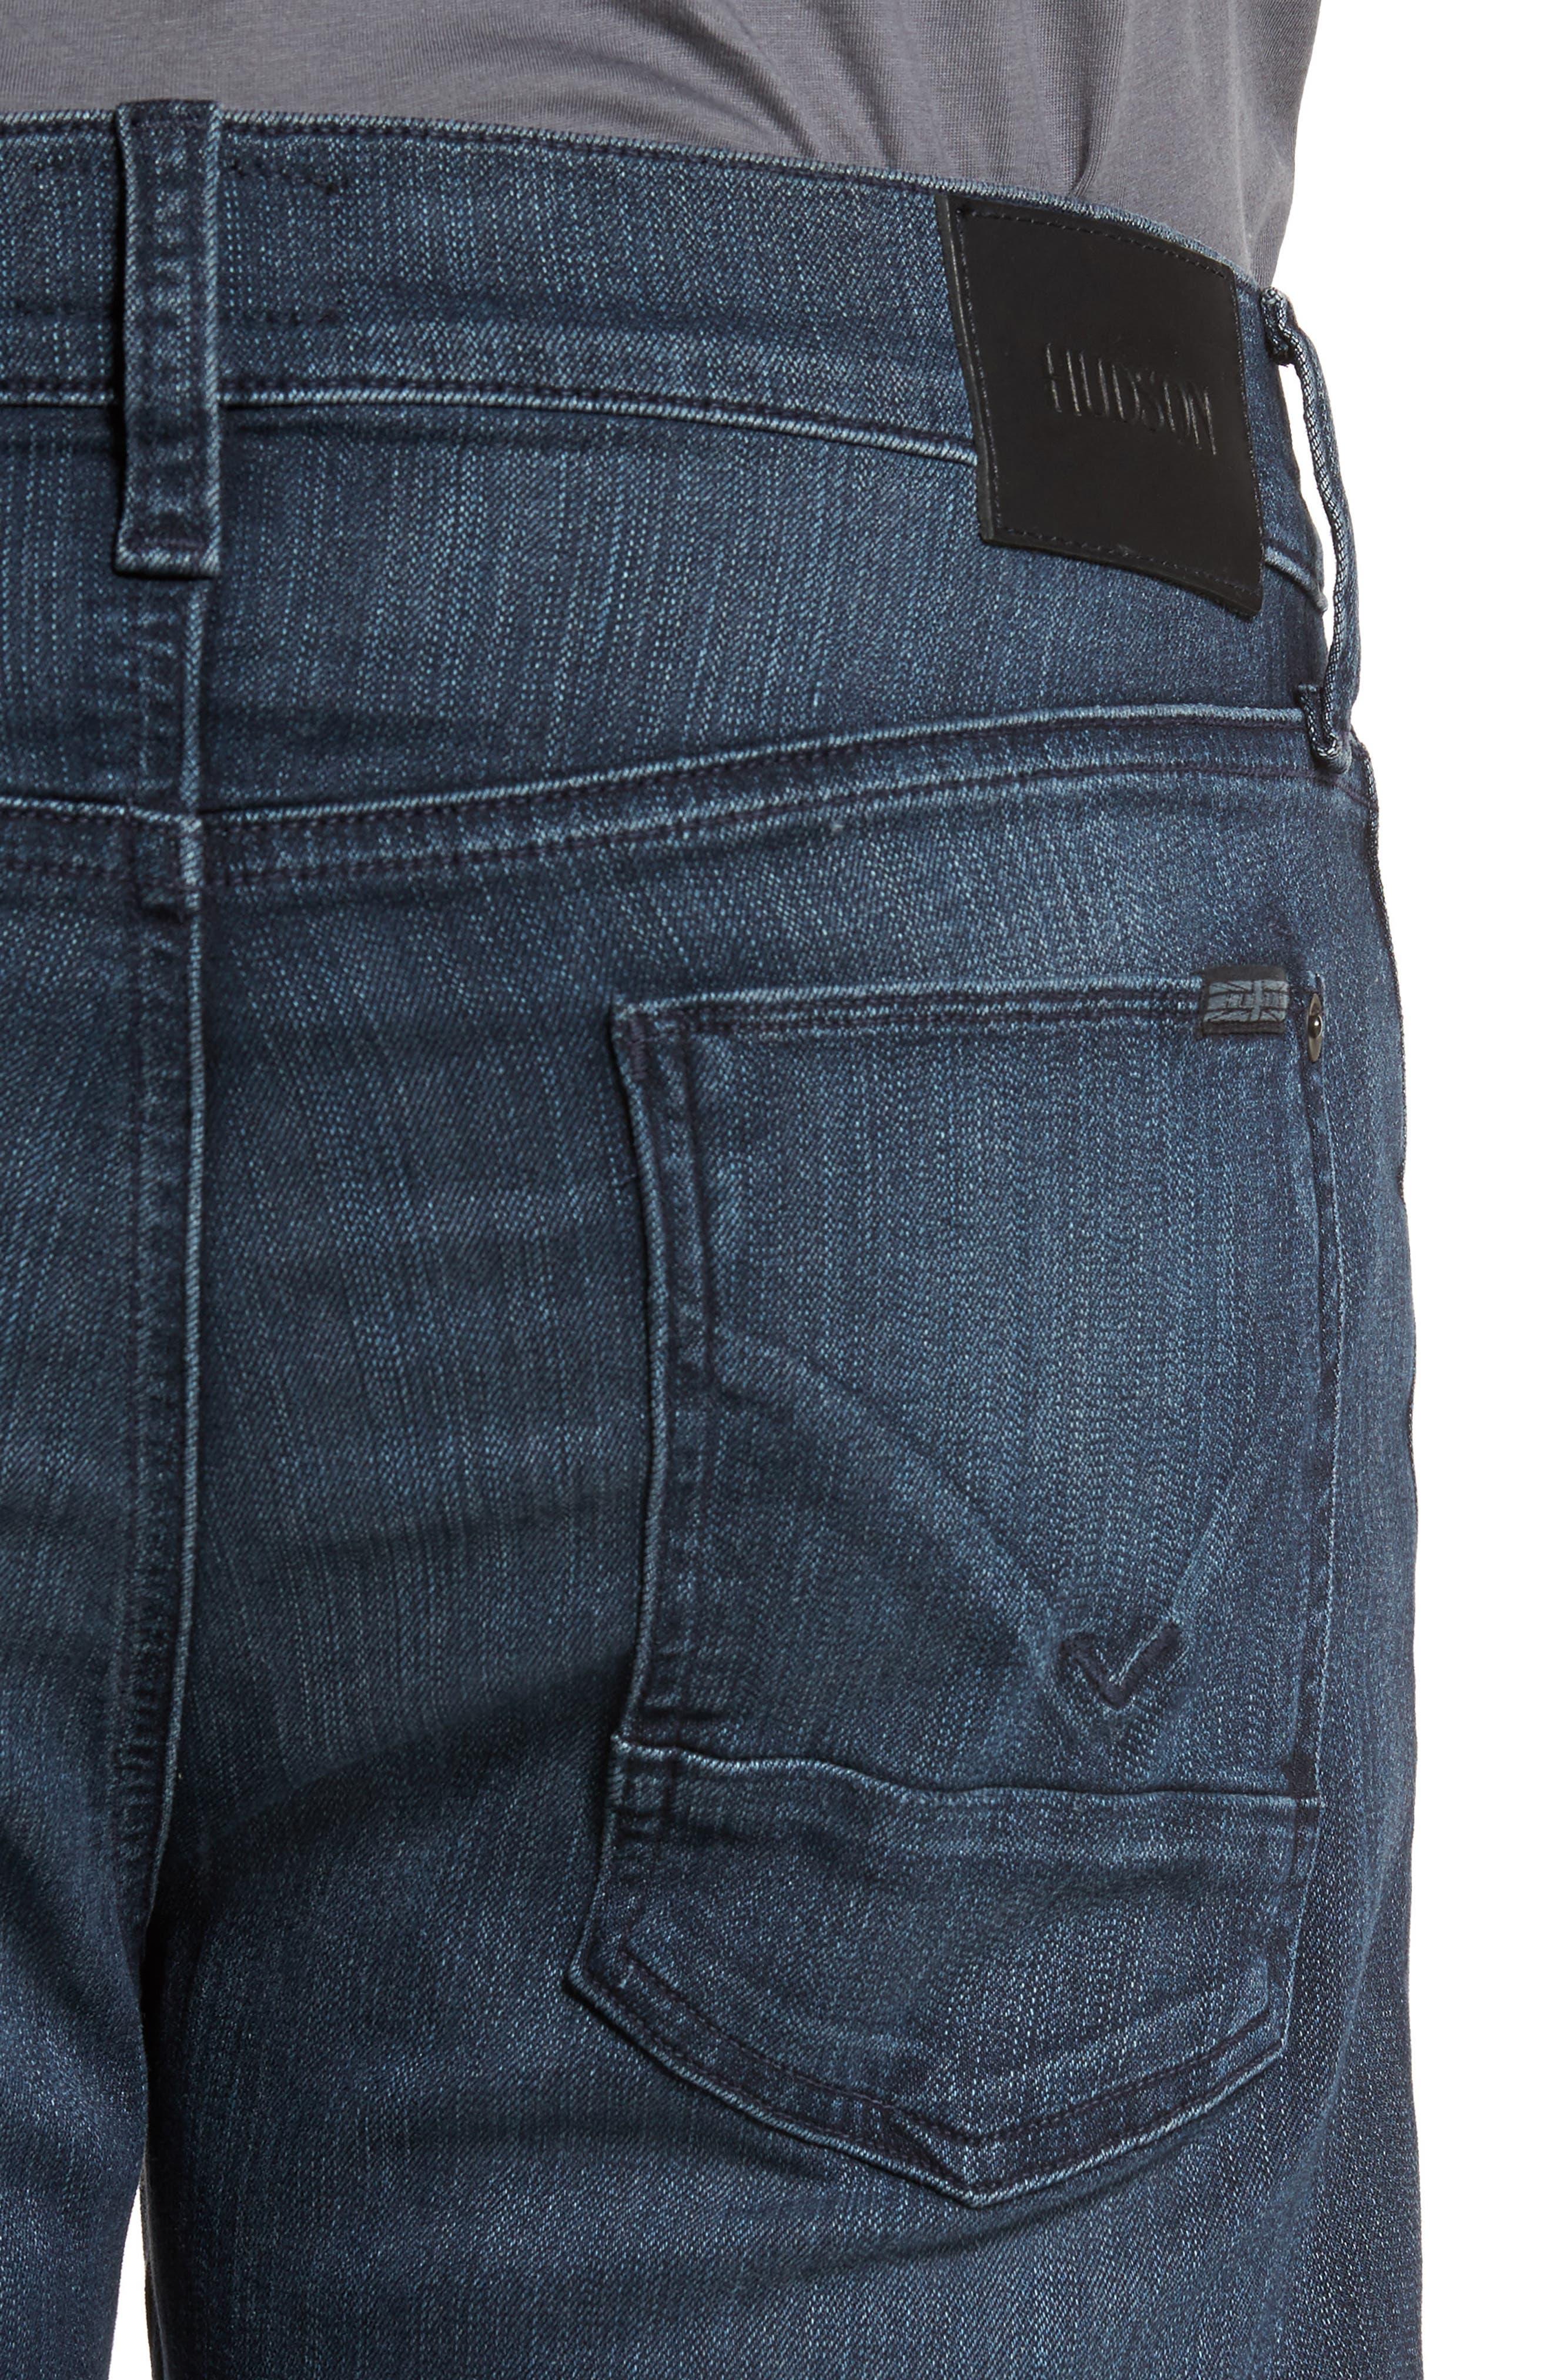 Blake Slim Fit Jeans,                             Alternate thumbnail 4, color,                             400